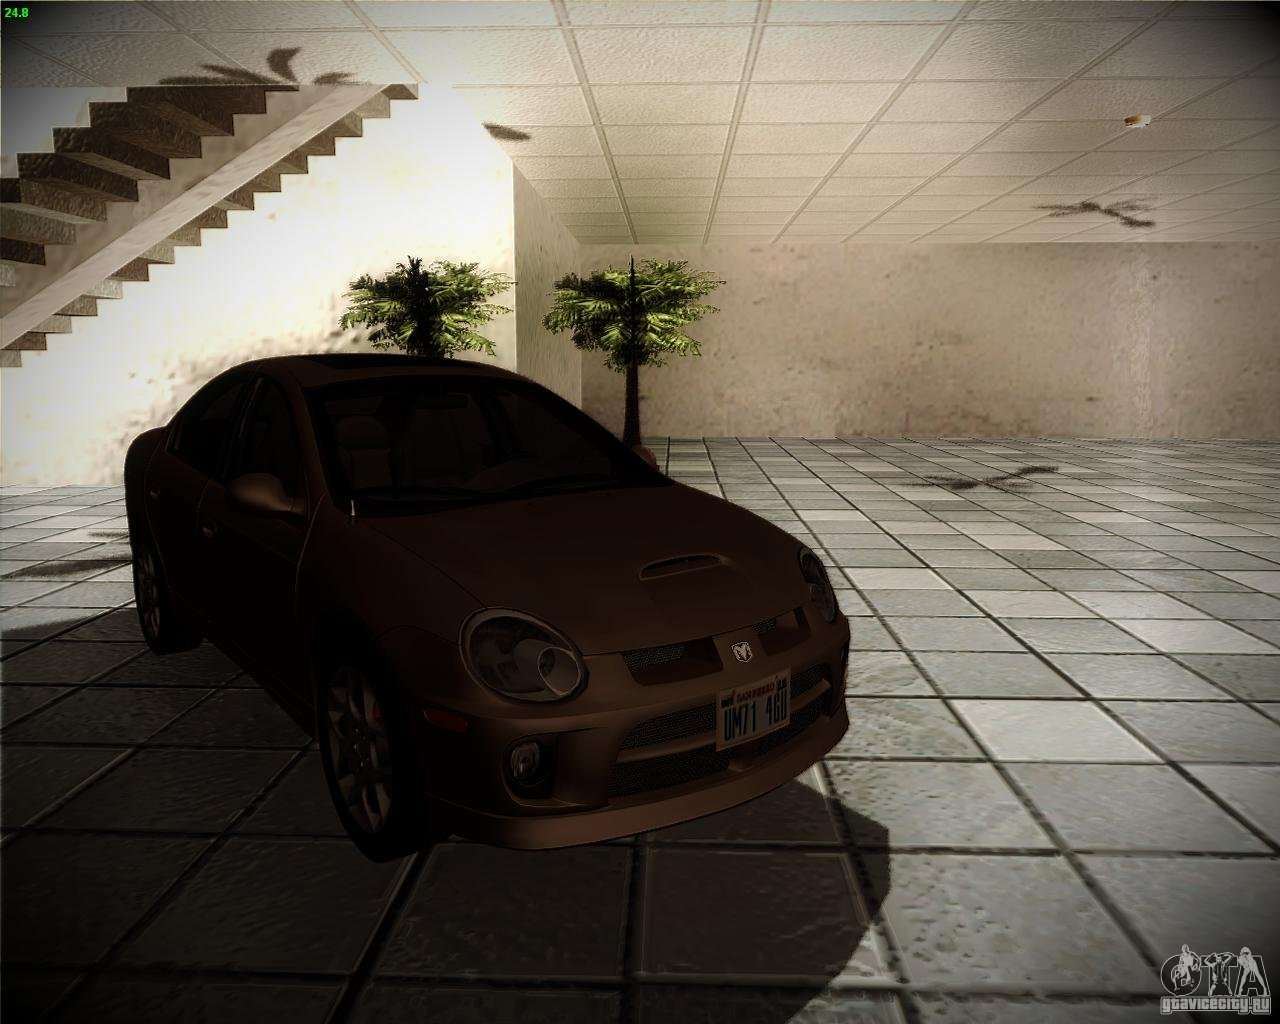 Collection of graphics mods for gta san andreas ninth screenshot